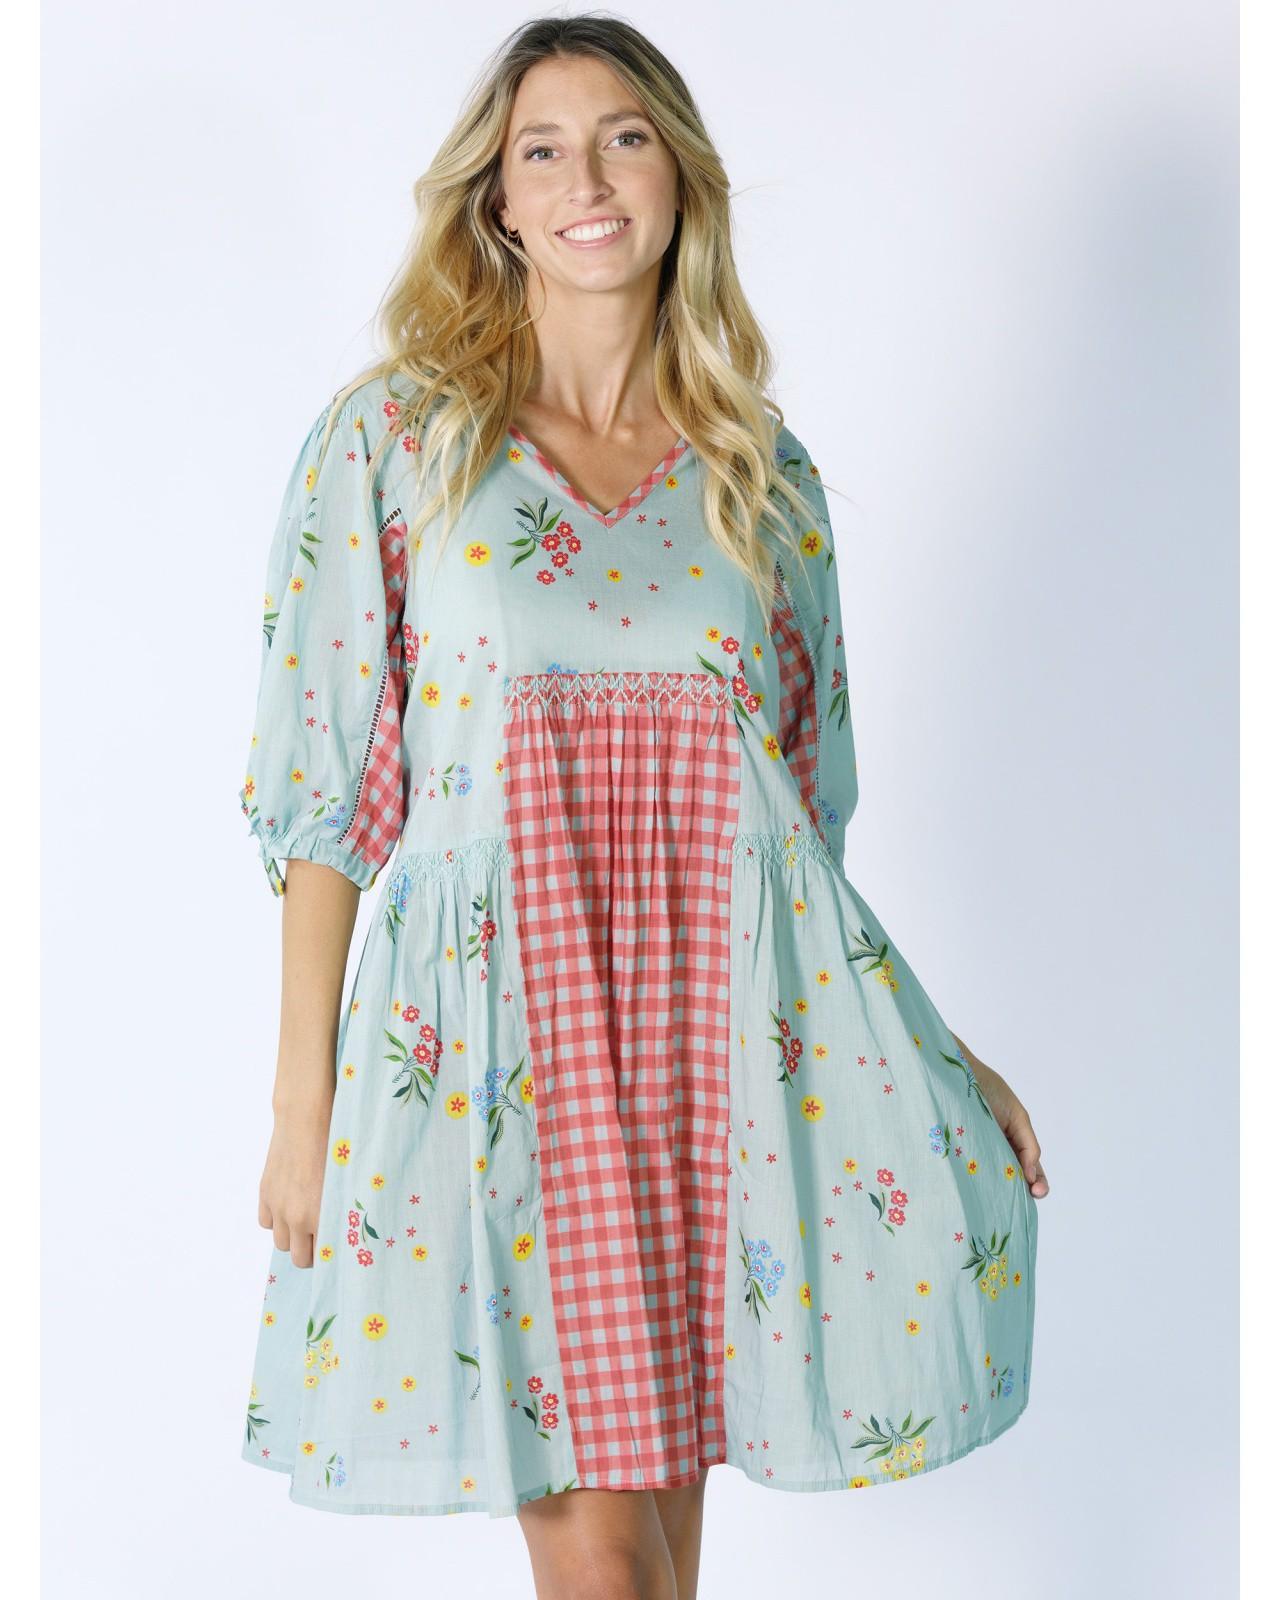 Rhum Raisin floral dress, Azur 69